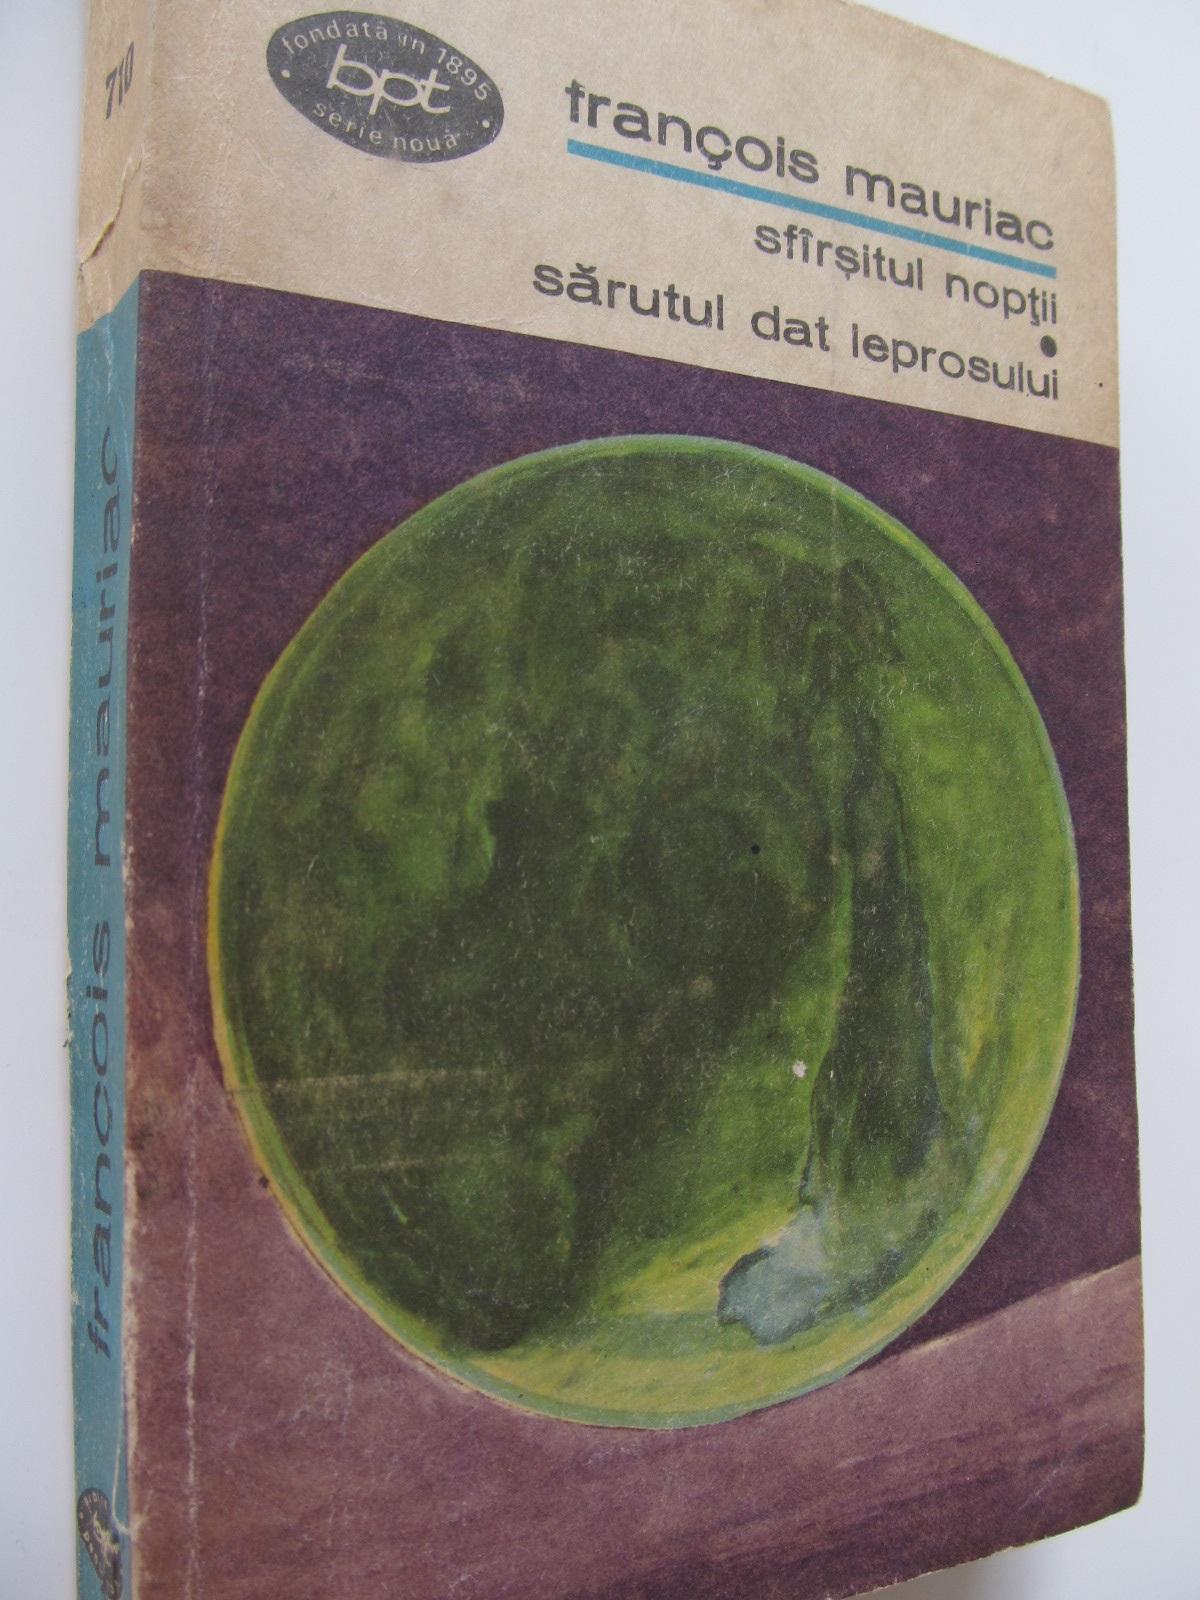 Sfarsitul noptii. Sarutul dat leprosului - Francois Mauriac | Detalii carte